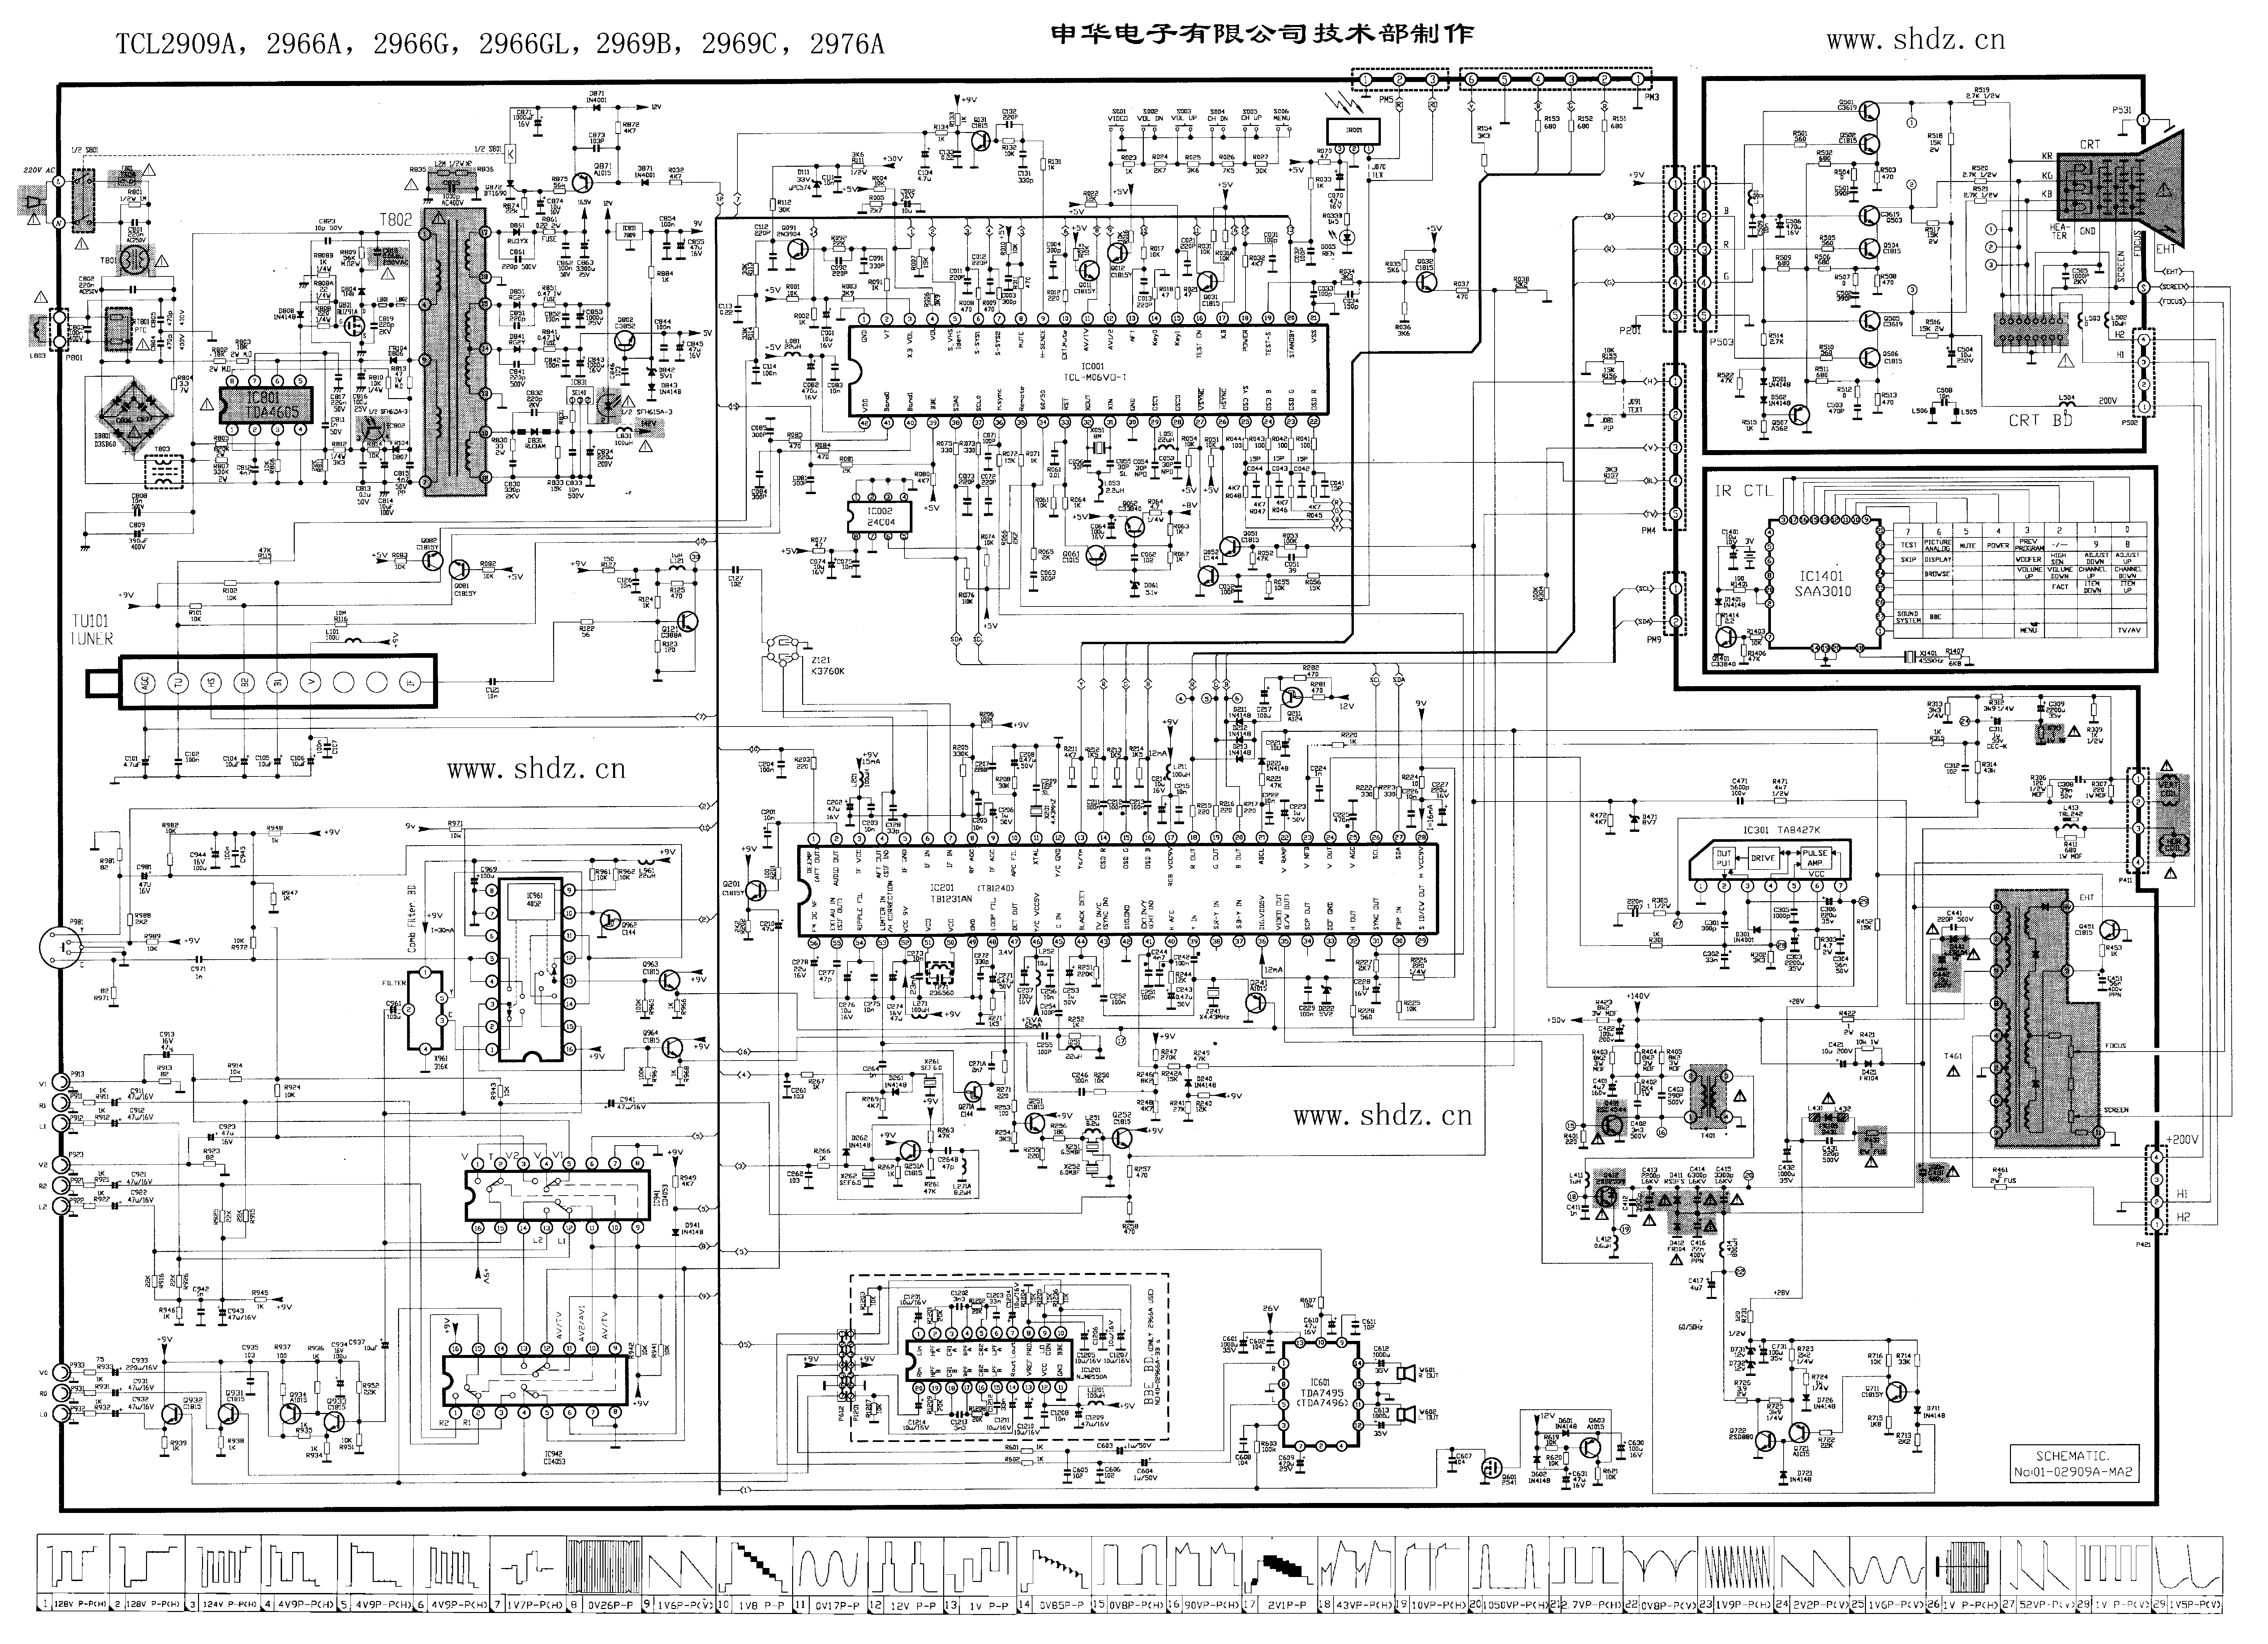 [DIAGRAM] Jvc Av N29220 Color Tv Schematic Diagram Manual